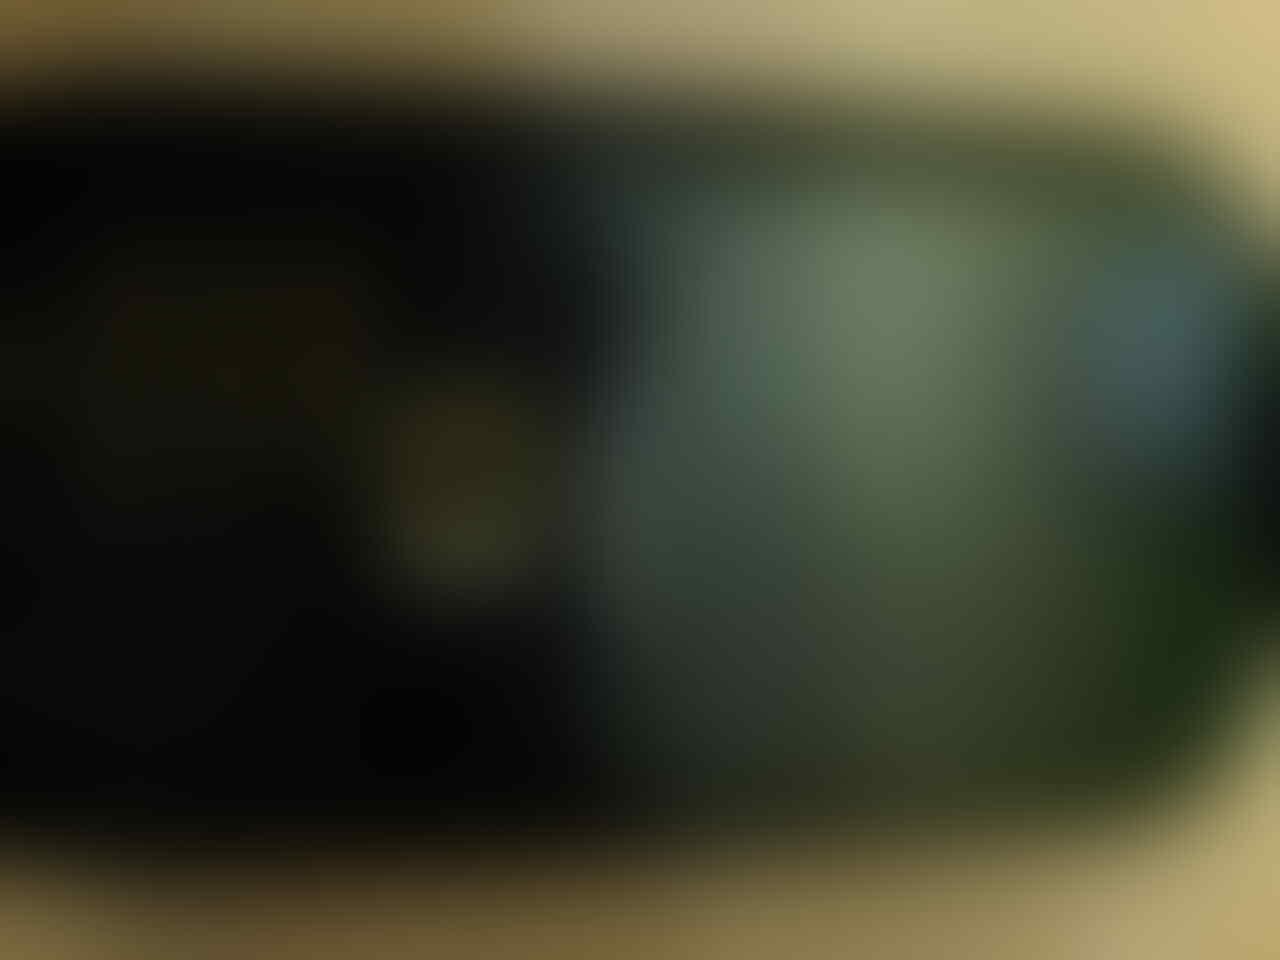 [Sell] Samsung Corby txt harga miring